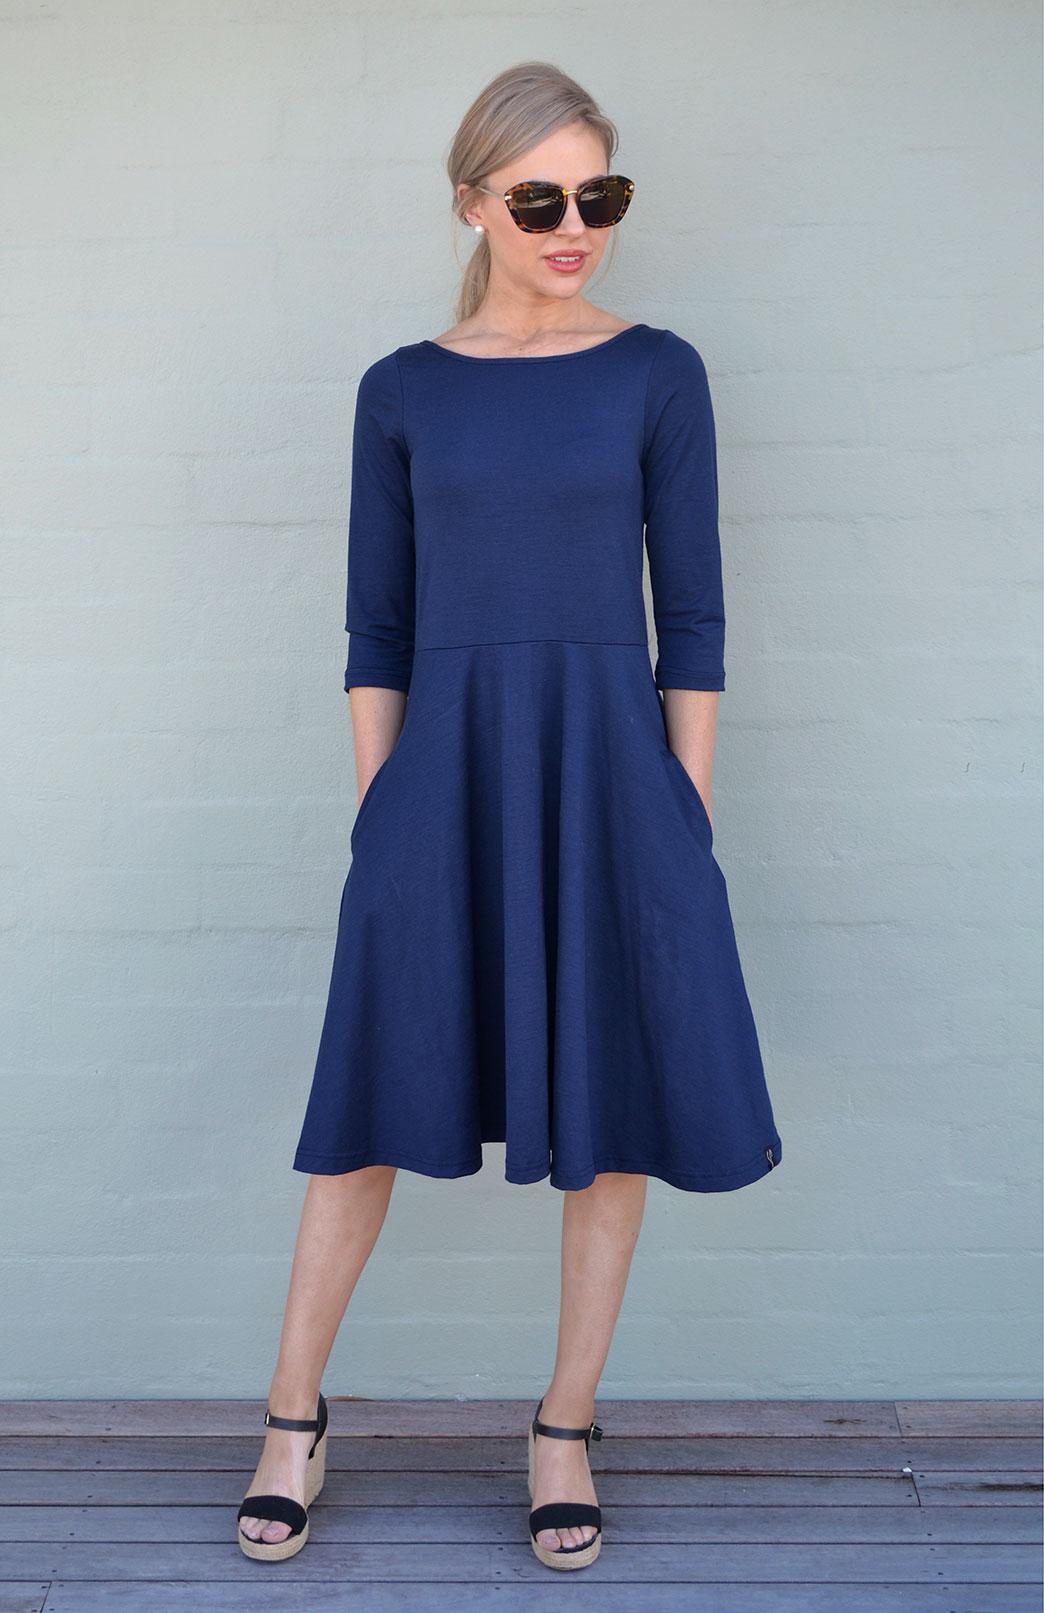 4acf3cb54c610 Mary Dress - Women s Indigo Blue Knee Length 3 4 Sleeved Fit and Flare  Merino. Enlarge